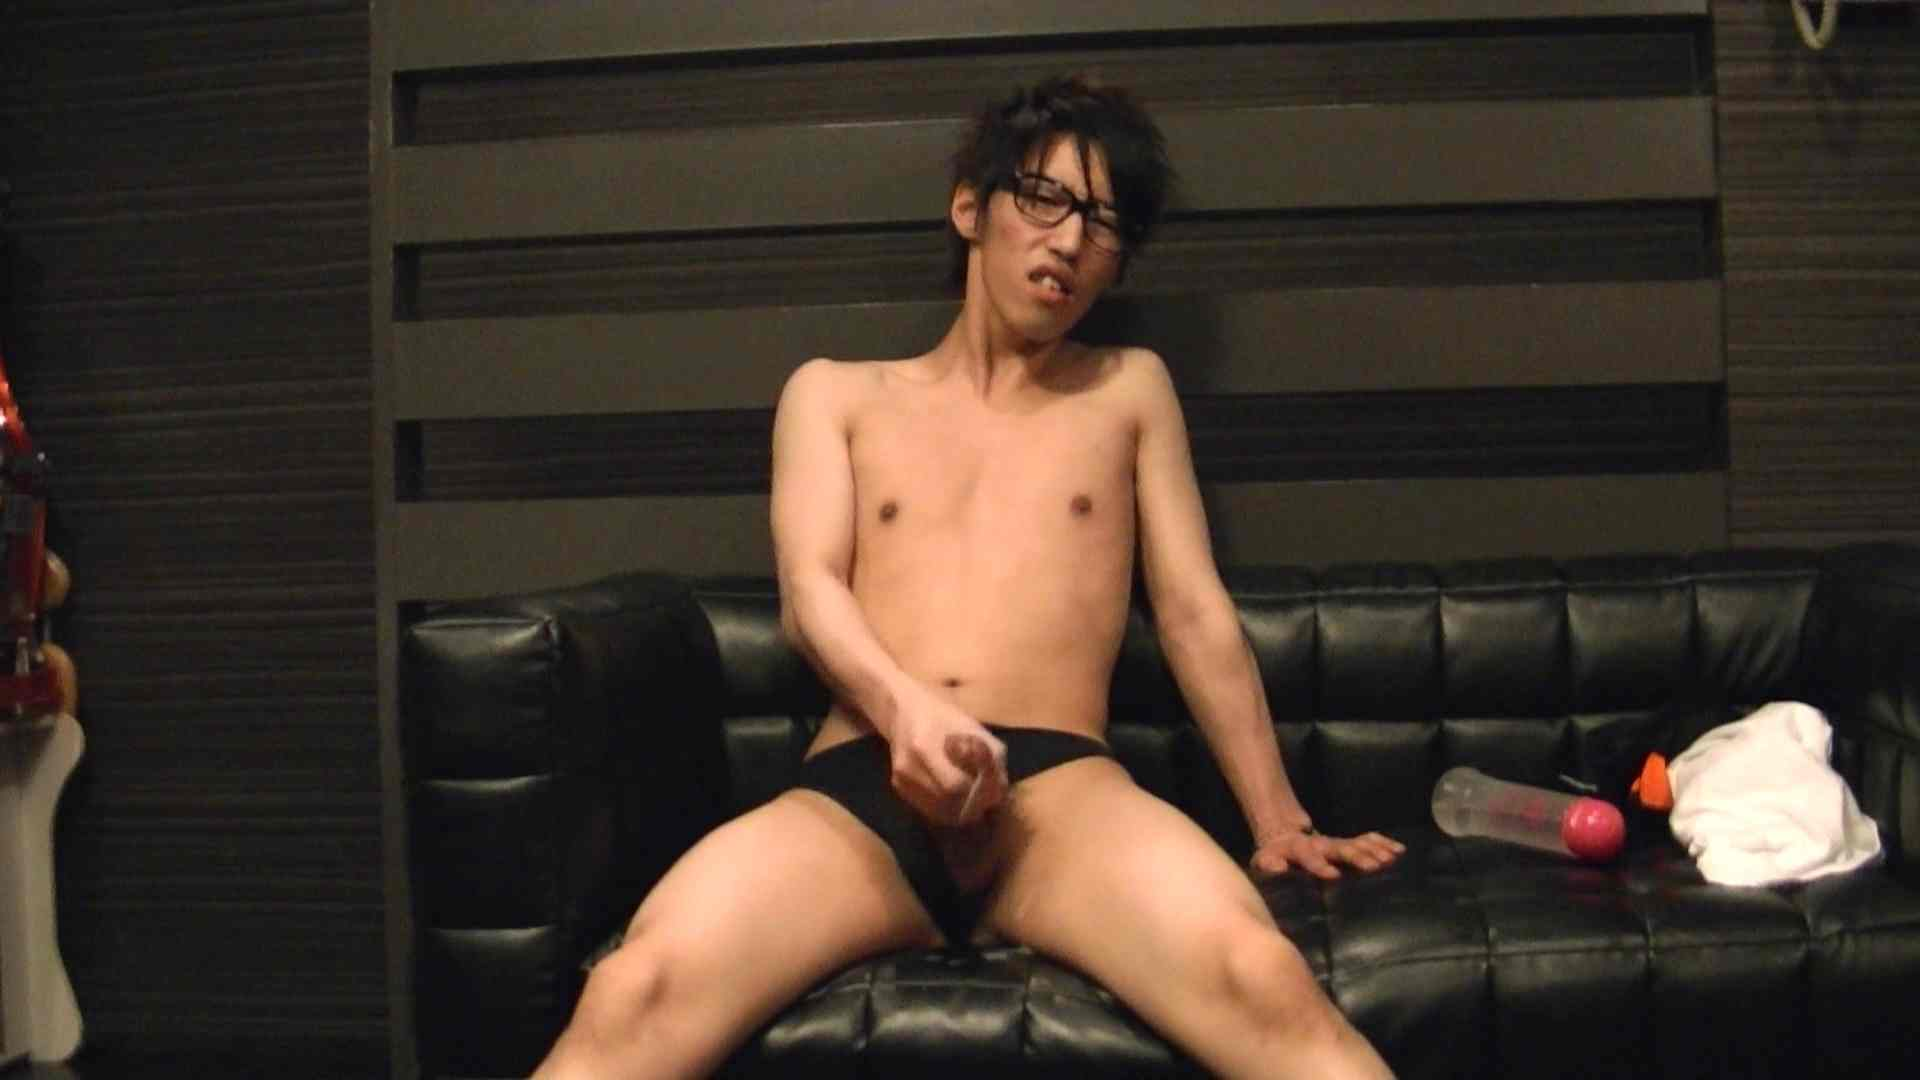 Mr.オナックスさん投稿!HD 貴方のオナニー三万円で撮影させてください。VOL.04 0   投稿シリーズ  55連発 8